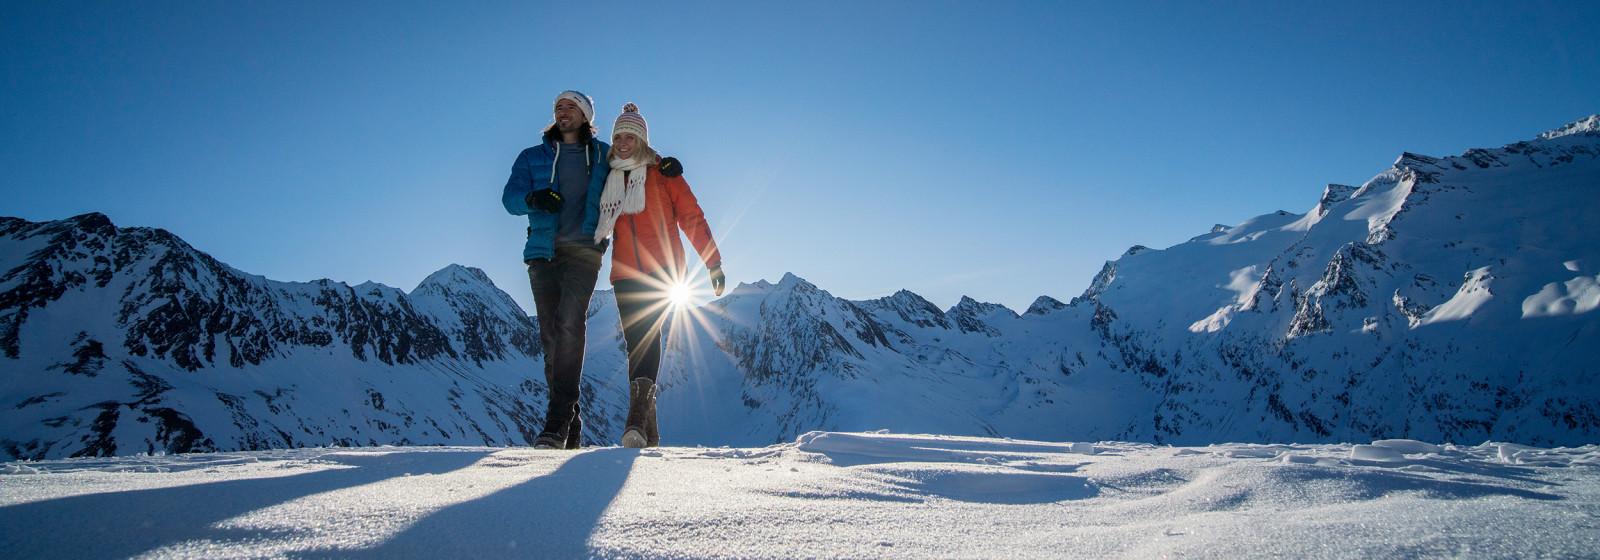 Winterwanderszene Hohe Mut, Oetztaler Alpen, Tirol, Oesterreich.